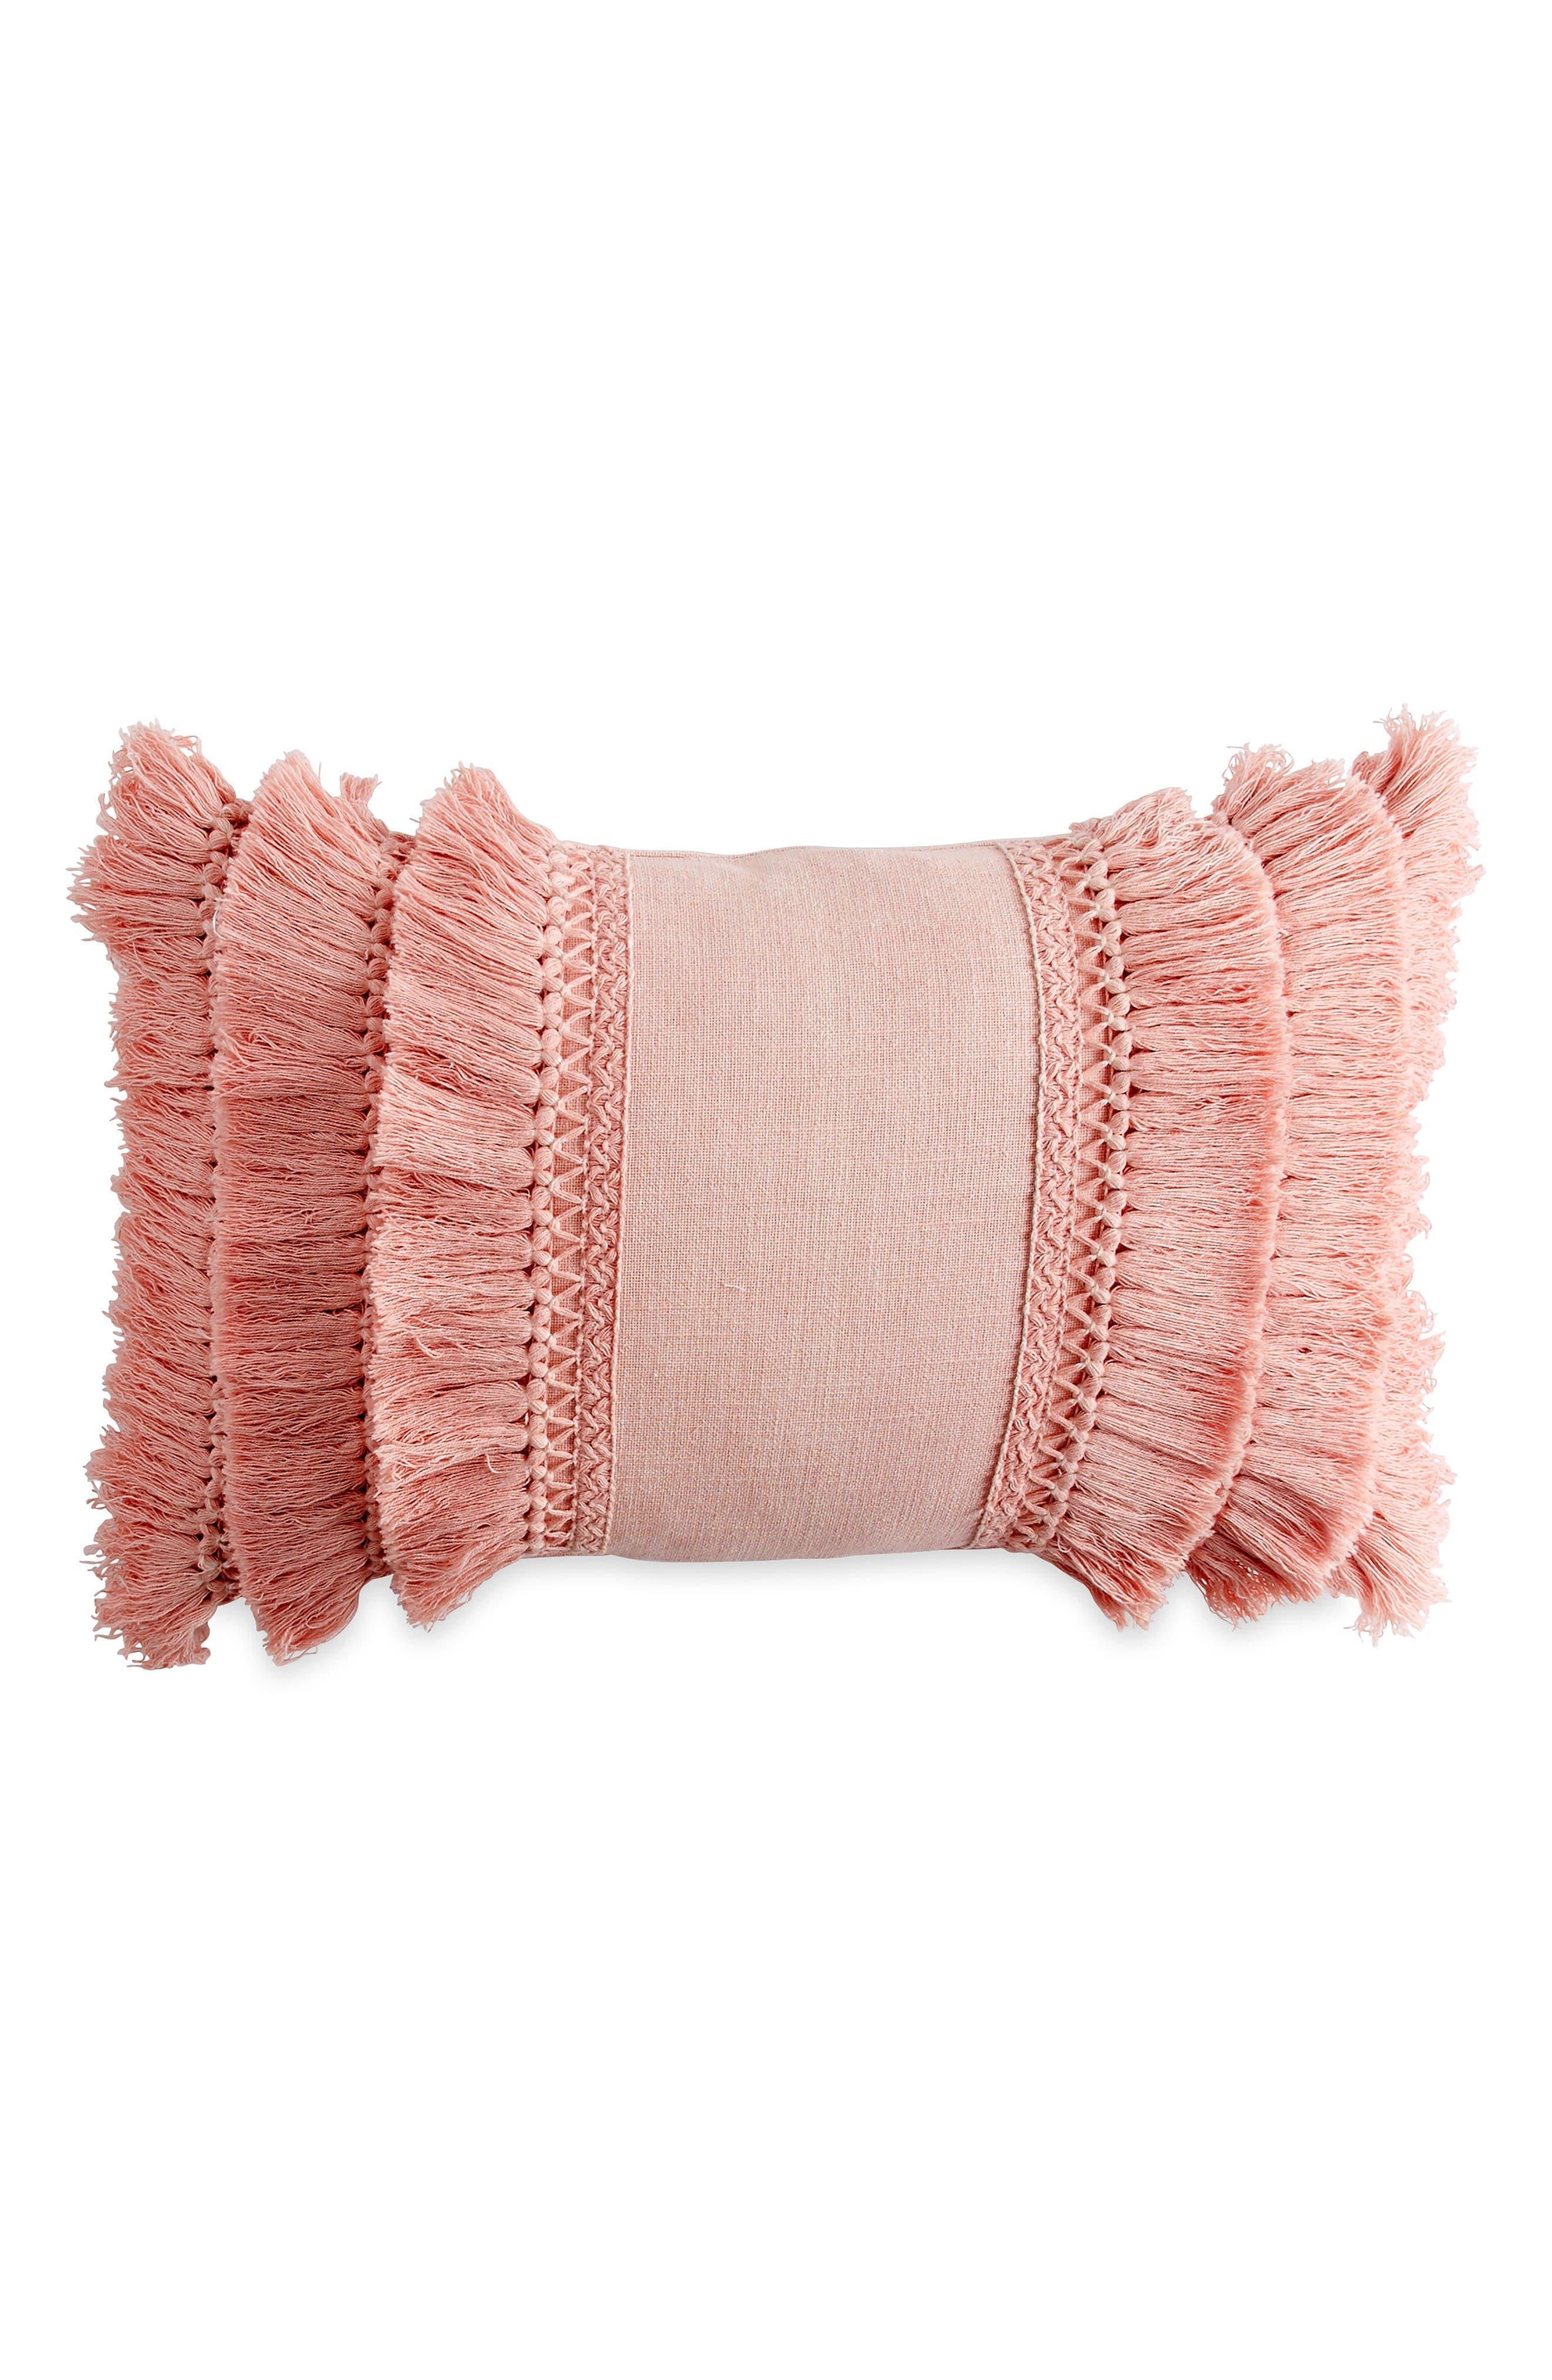 Main Image - Peri Home Fringe Pillow